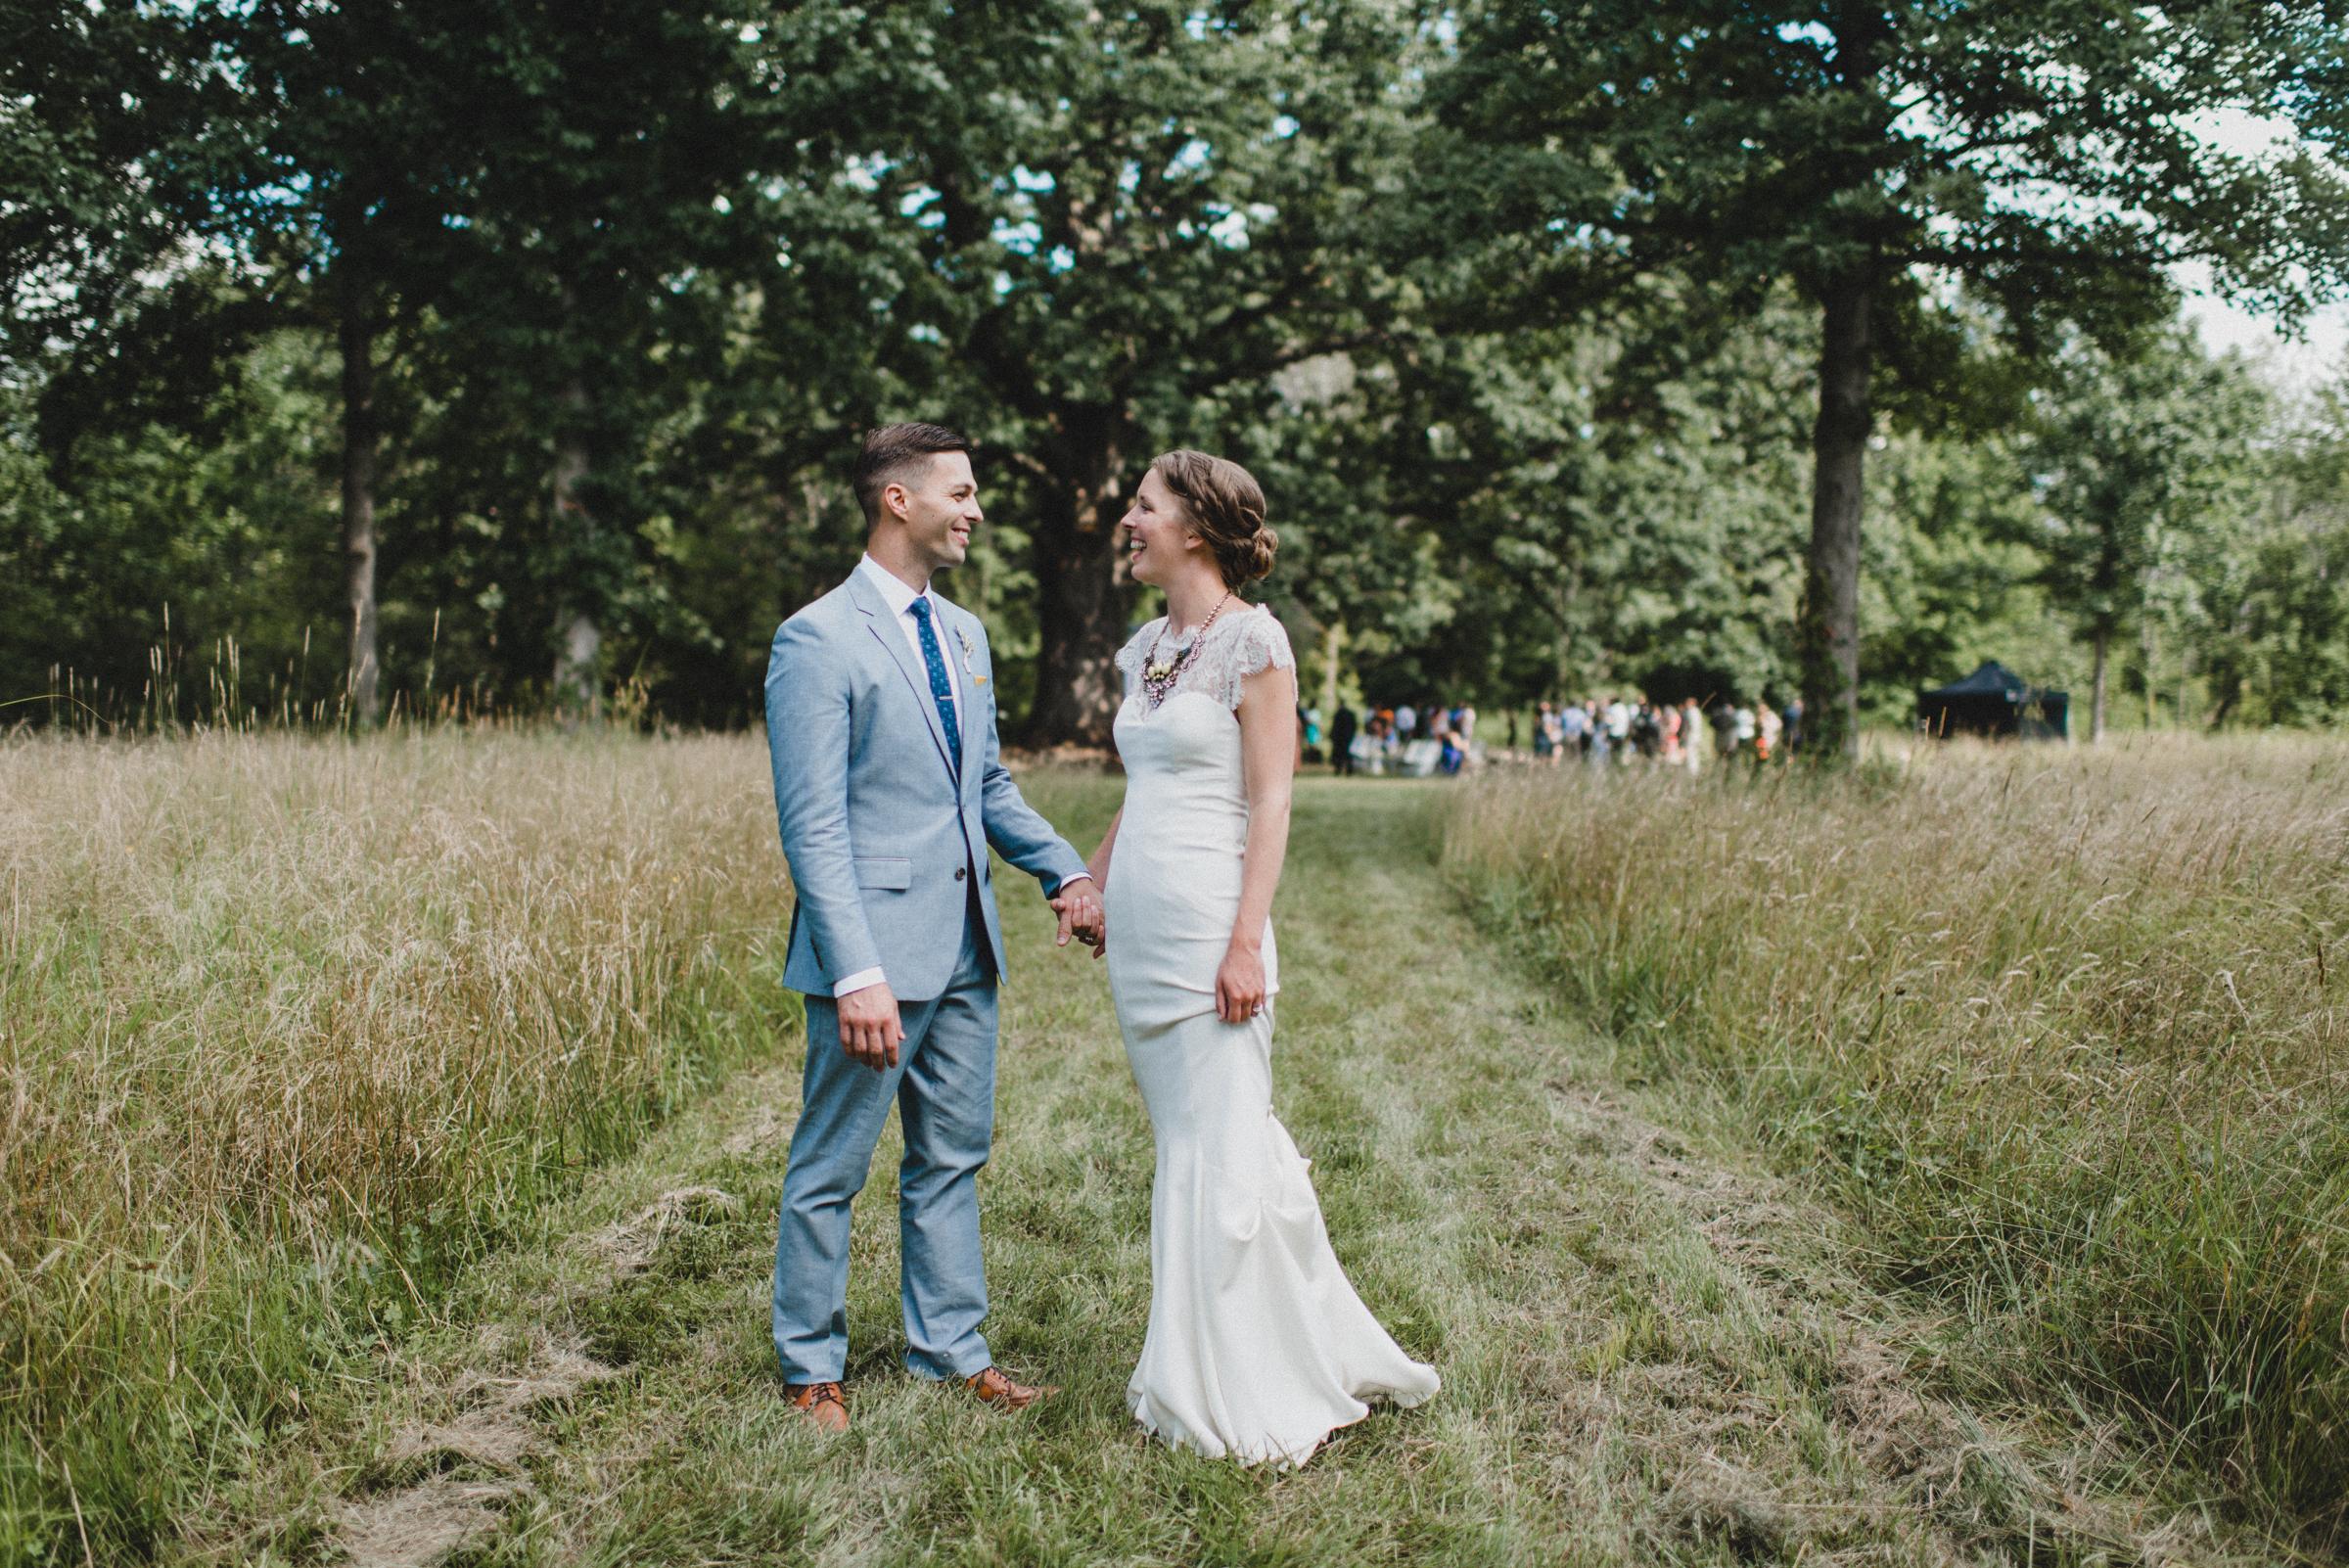 Intimate-Backyard-Farmhouse-Ohio-Wedding-Andi+Ben_Mallory+Justin-Photographers-174.JPG